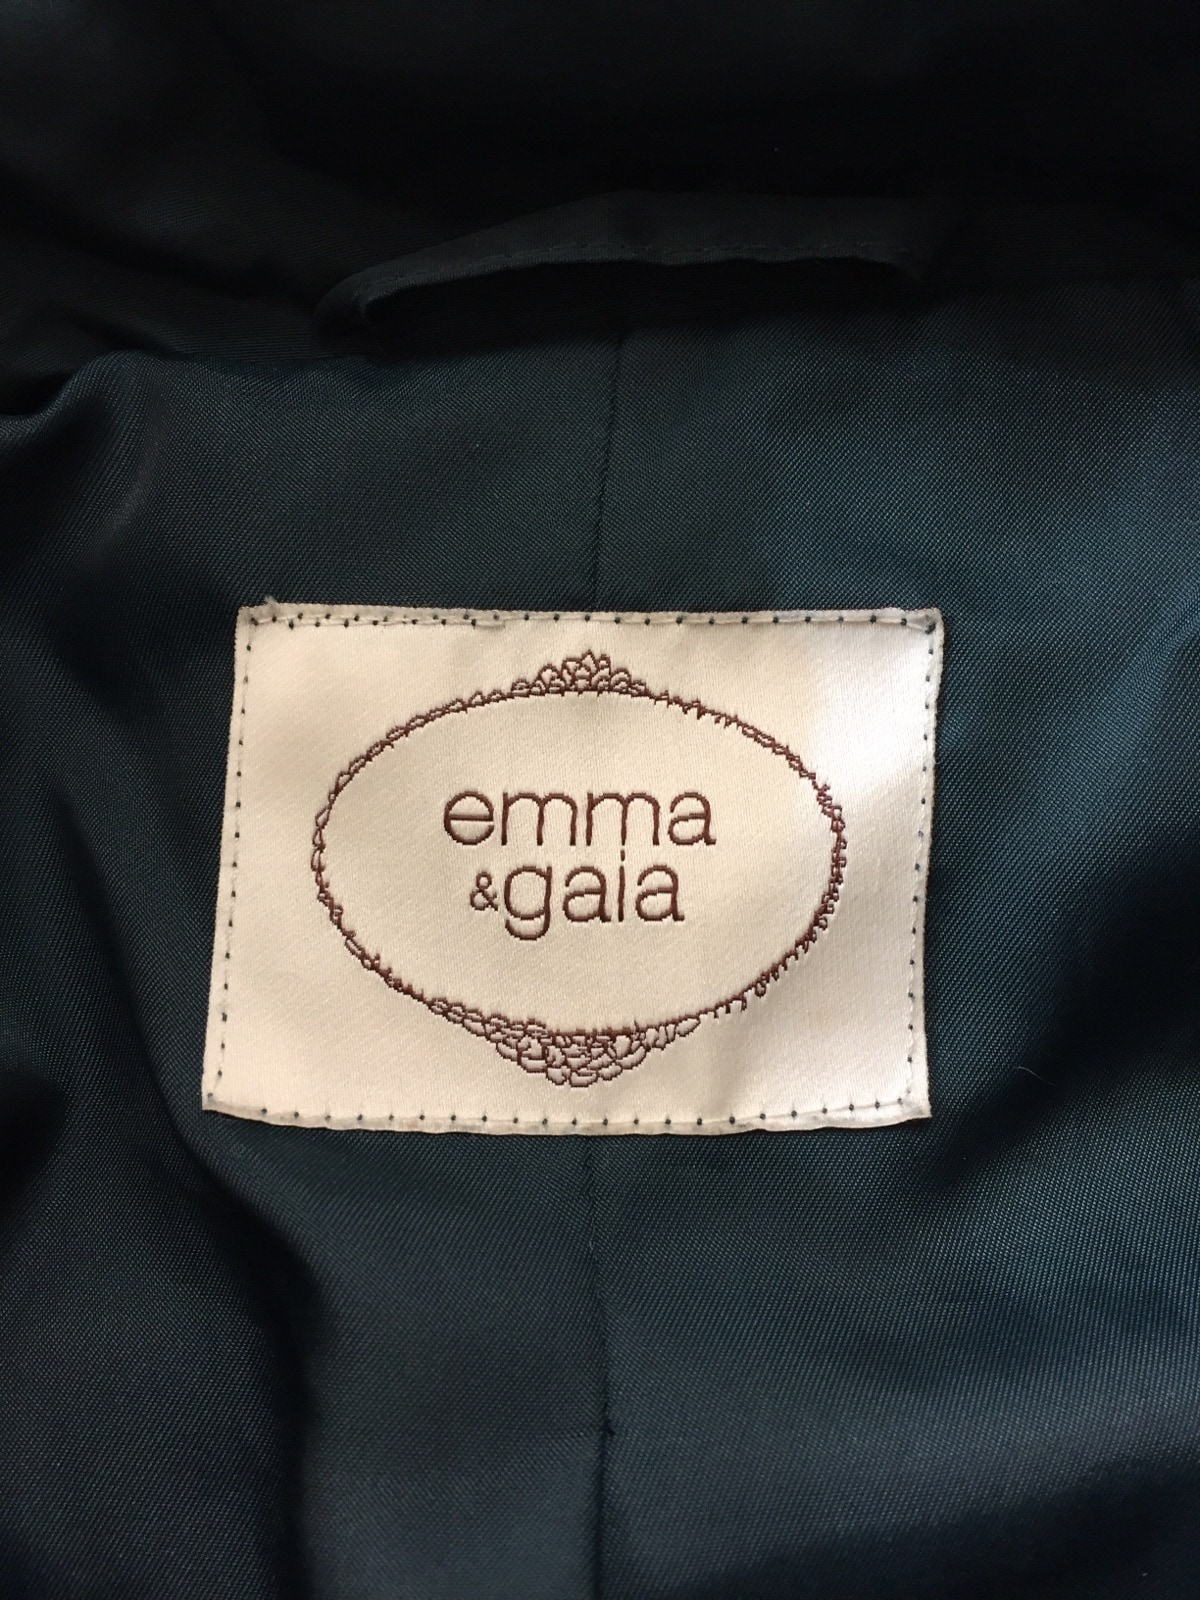 emma&gaia(エマアンドガイア)のダウンコート